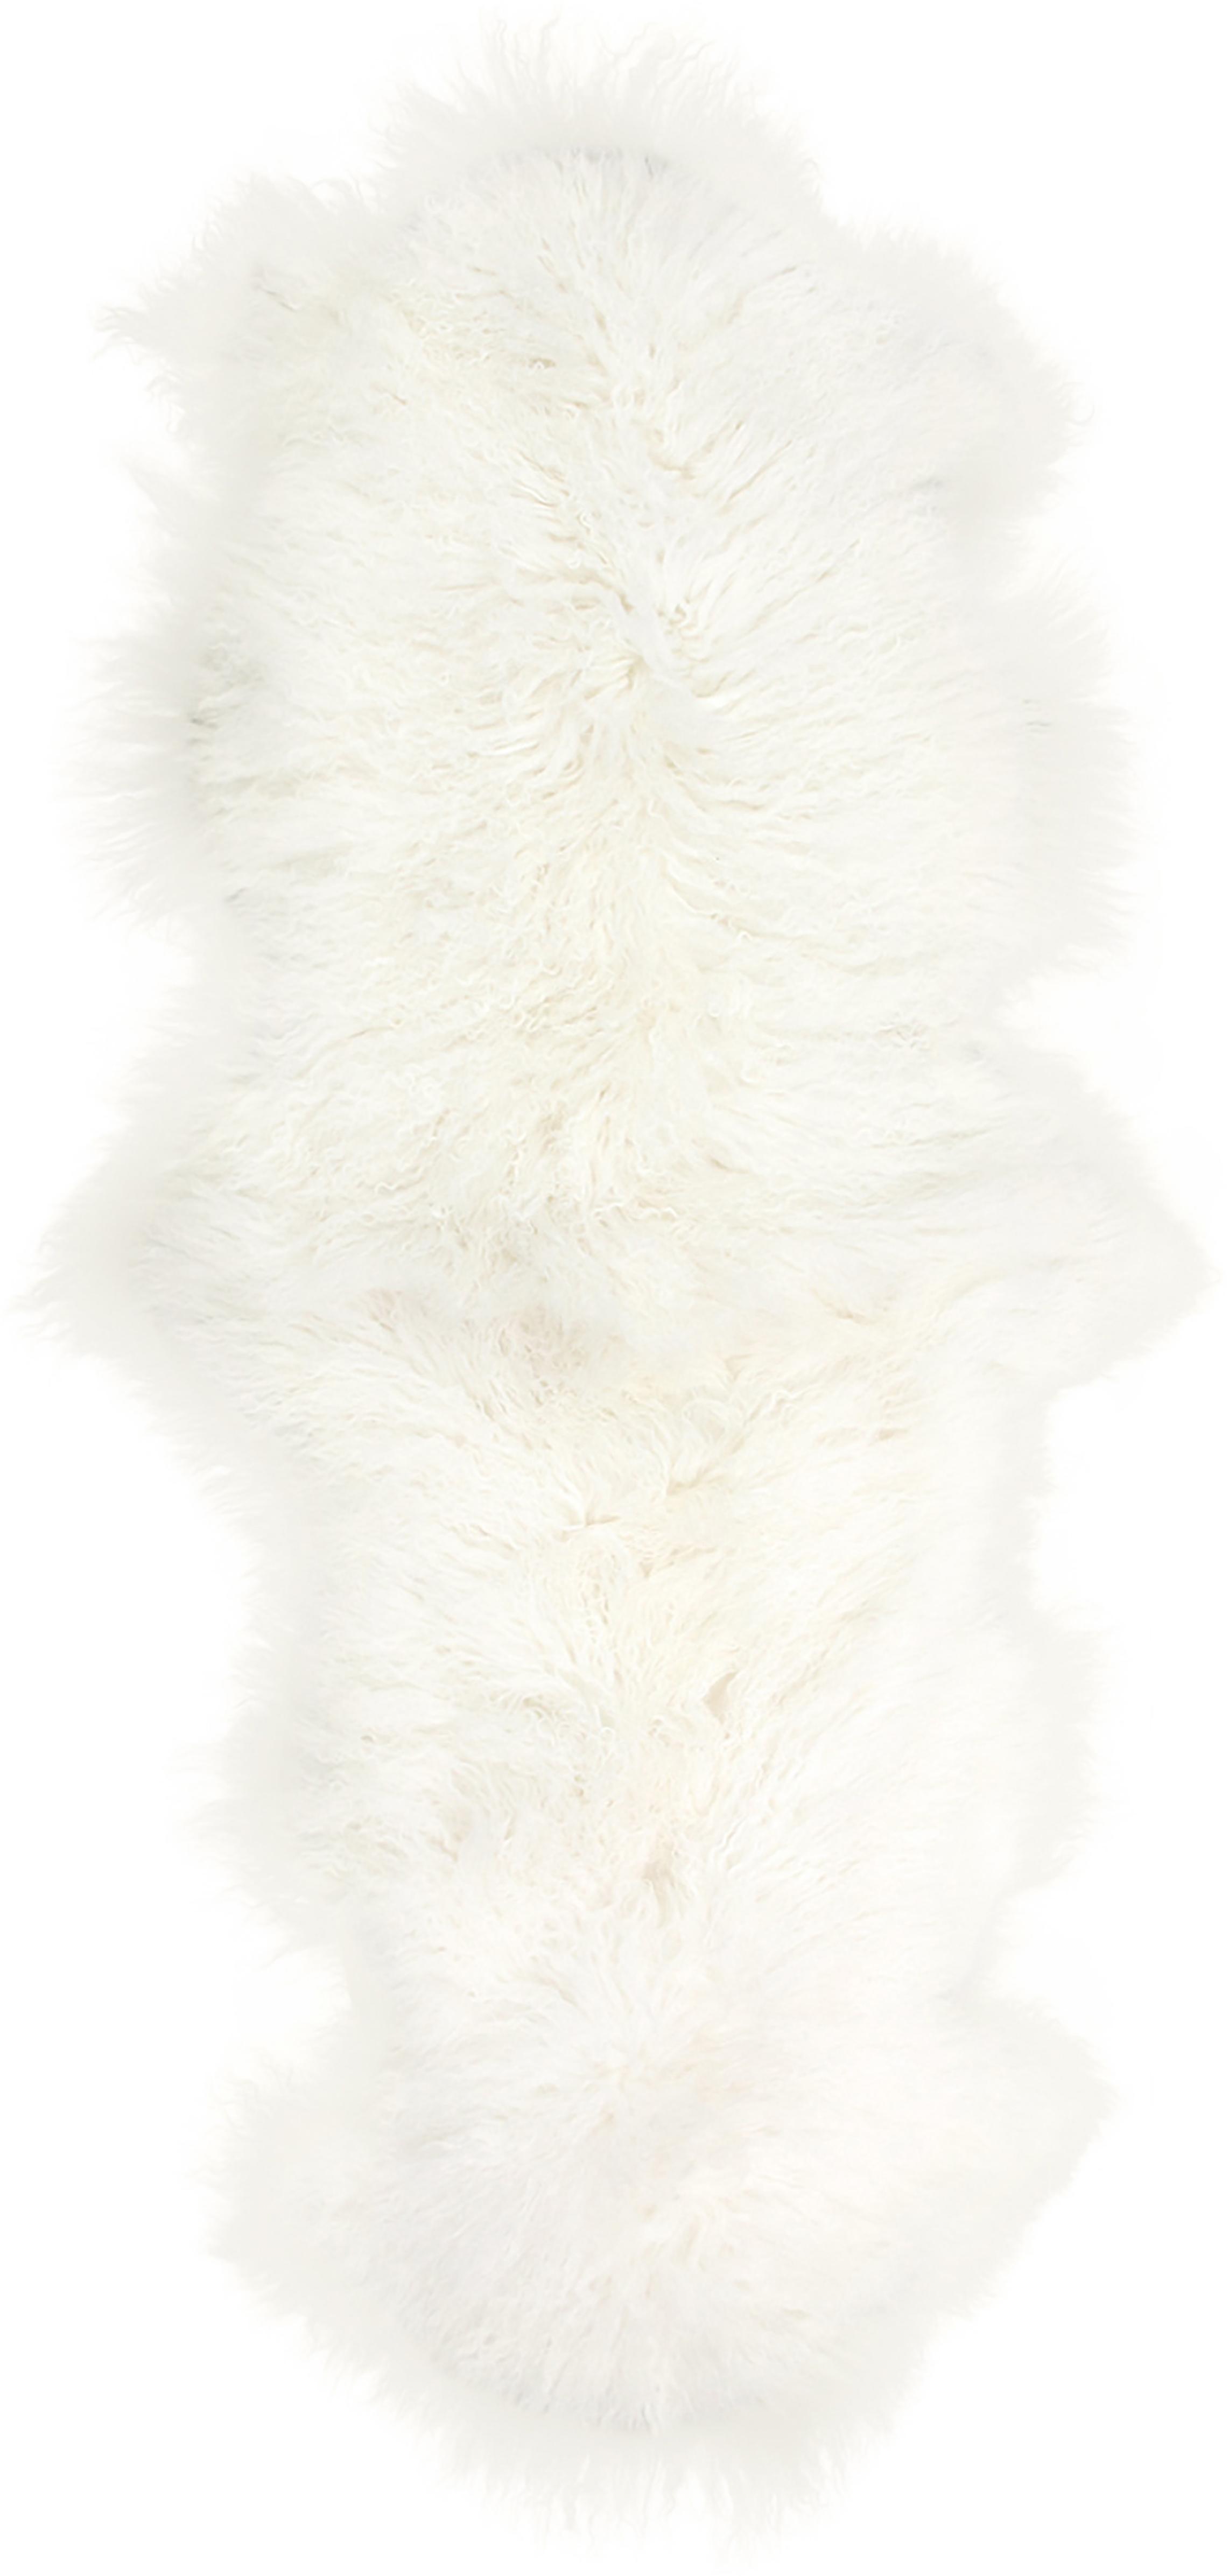 Langhaar-Lammfell-Teppich Ella, gelockt, Vorderseite: Mongolisches Lammfell, Rückseite: Leder, Naturweiss, 50 x 160 cm